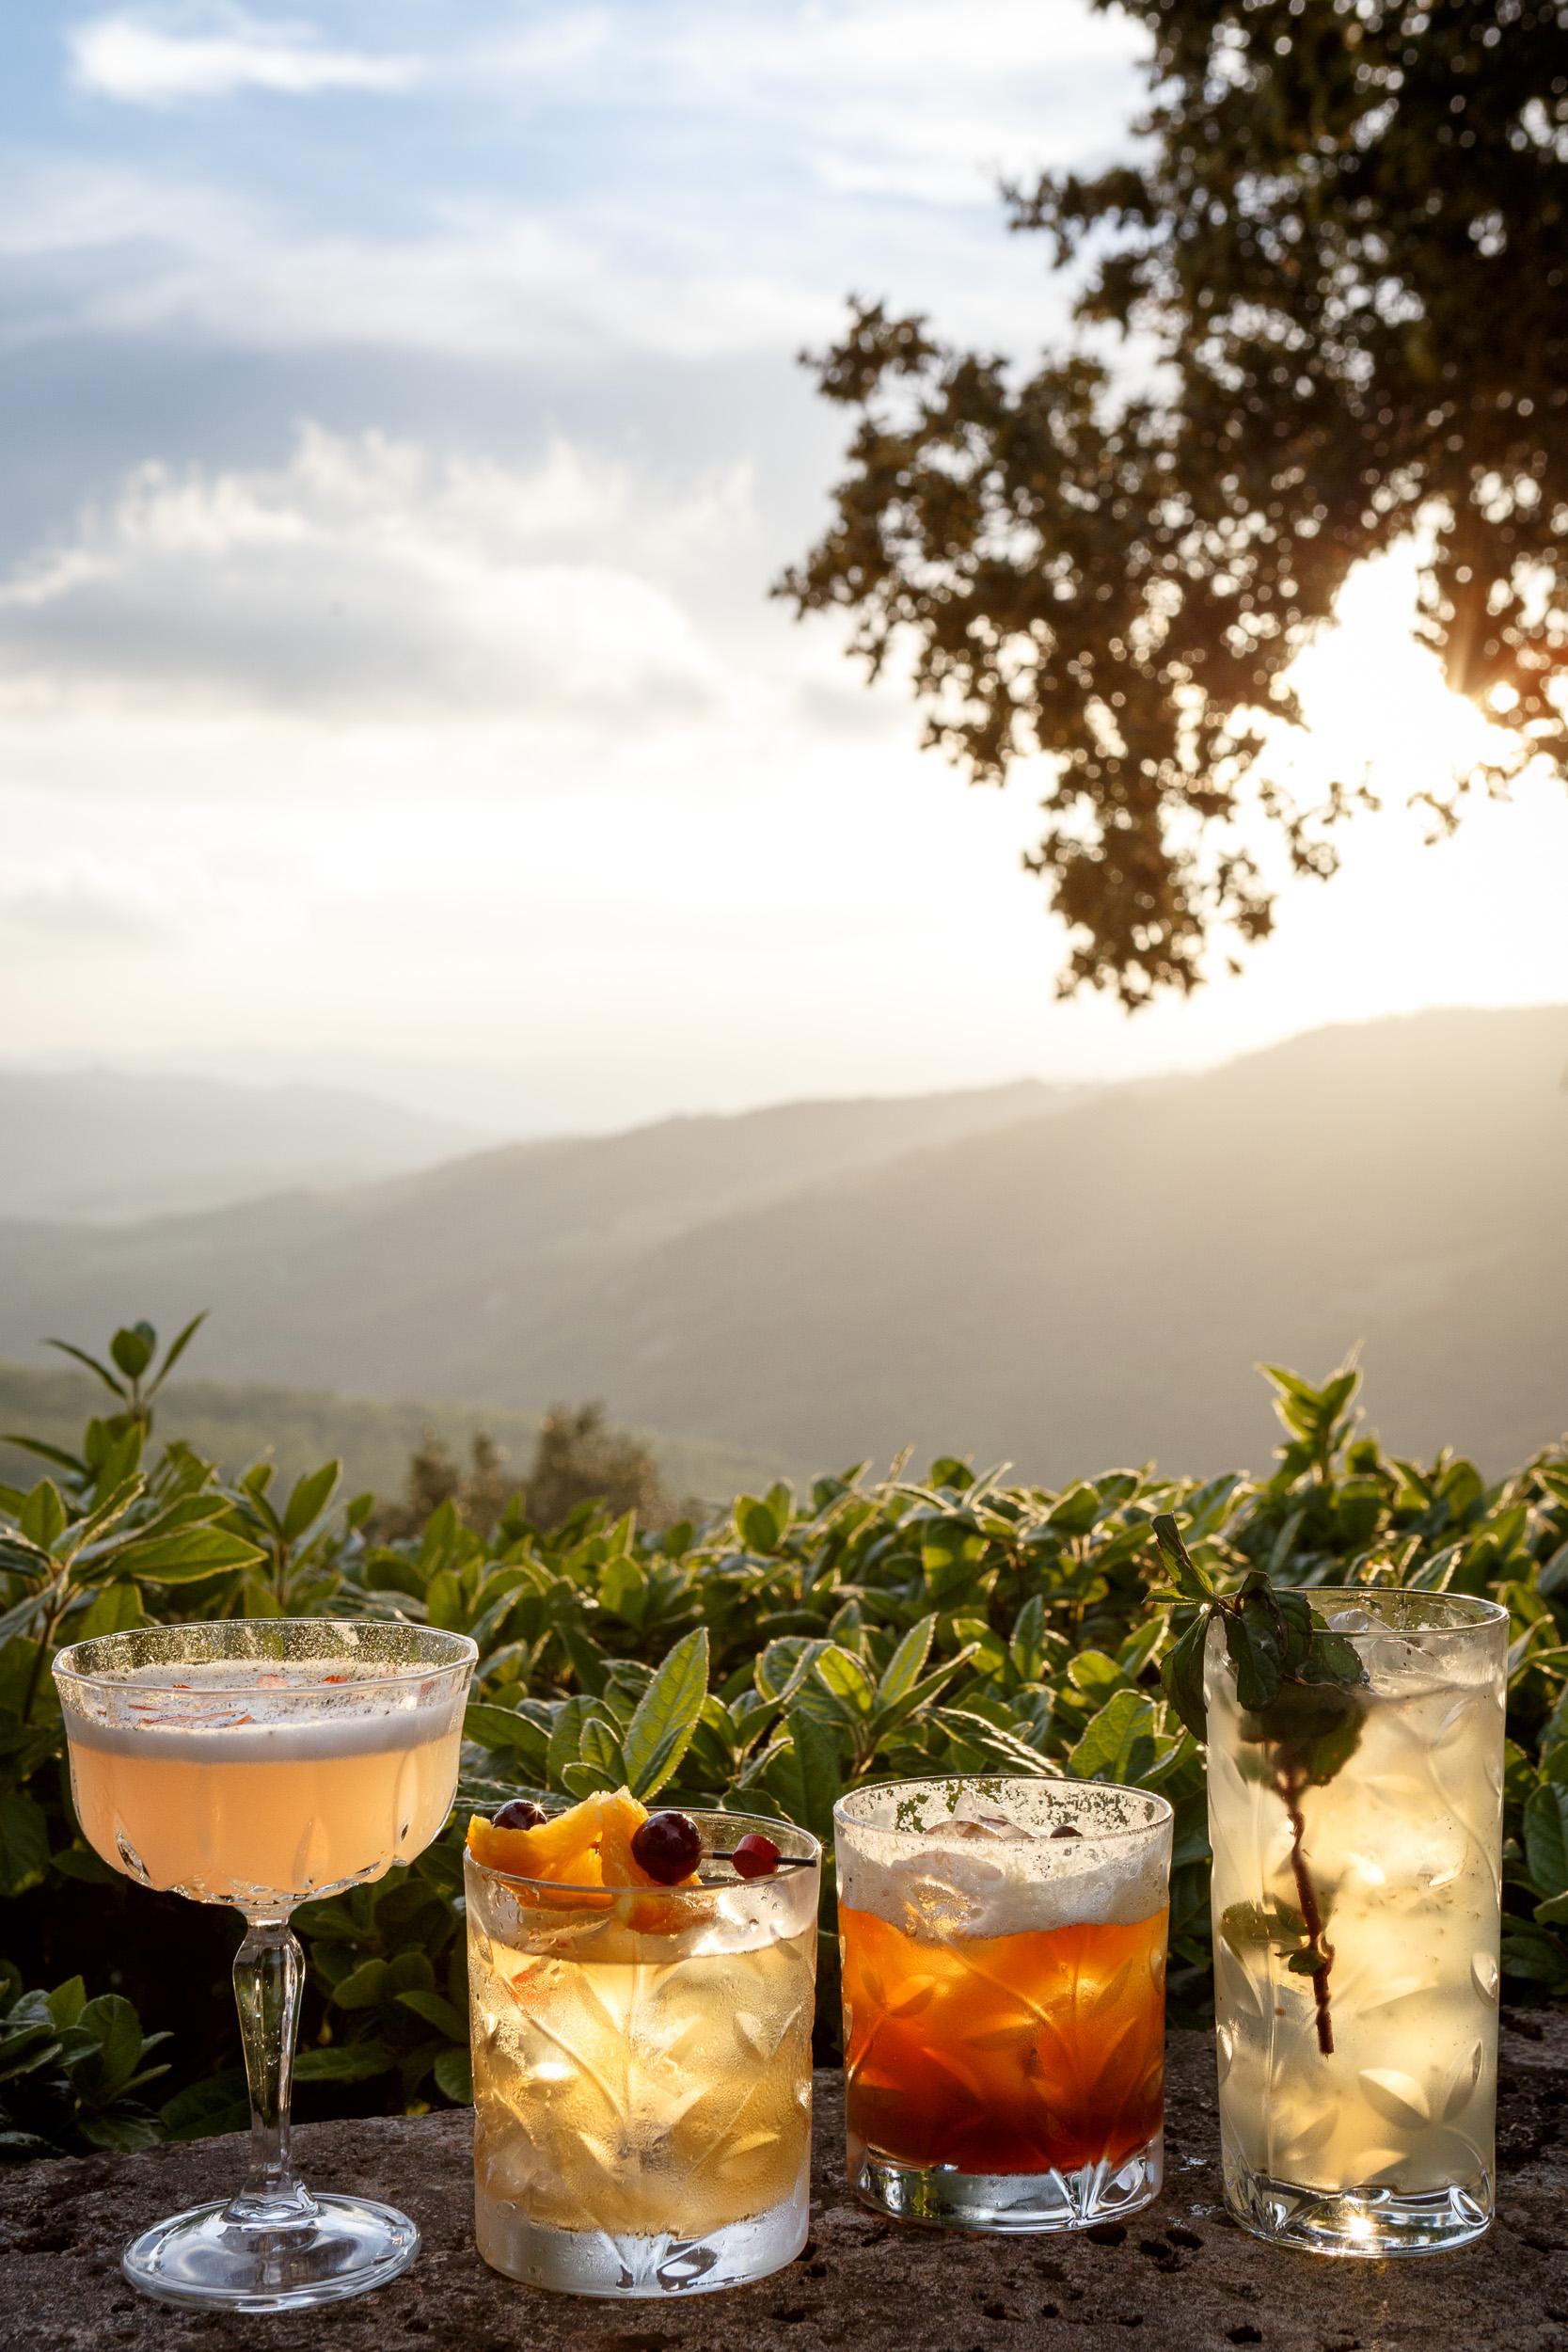 Cocktail drinks photography for Hotel Borgo Pignano